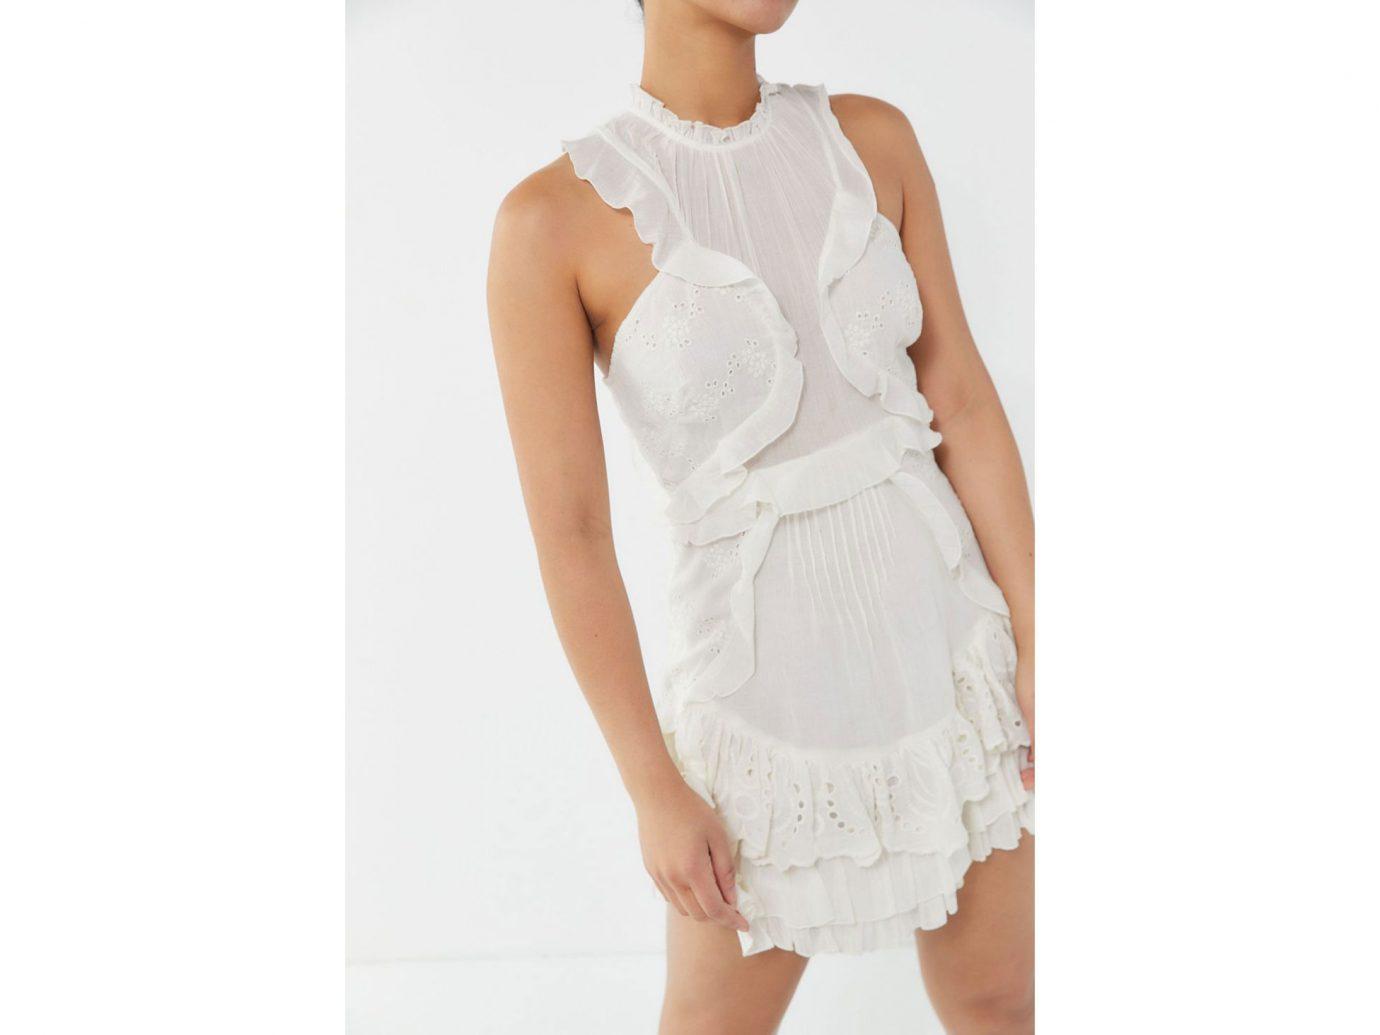 Urban Outfitters Mia Eyelet Ruffle Mini Dress